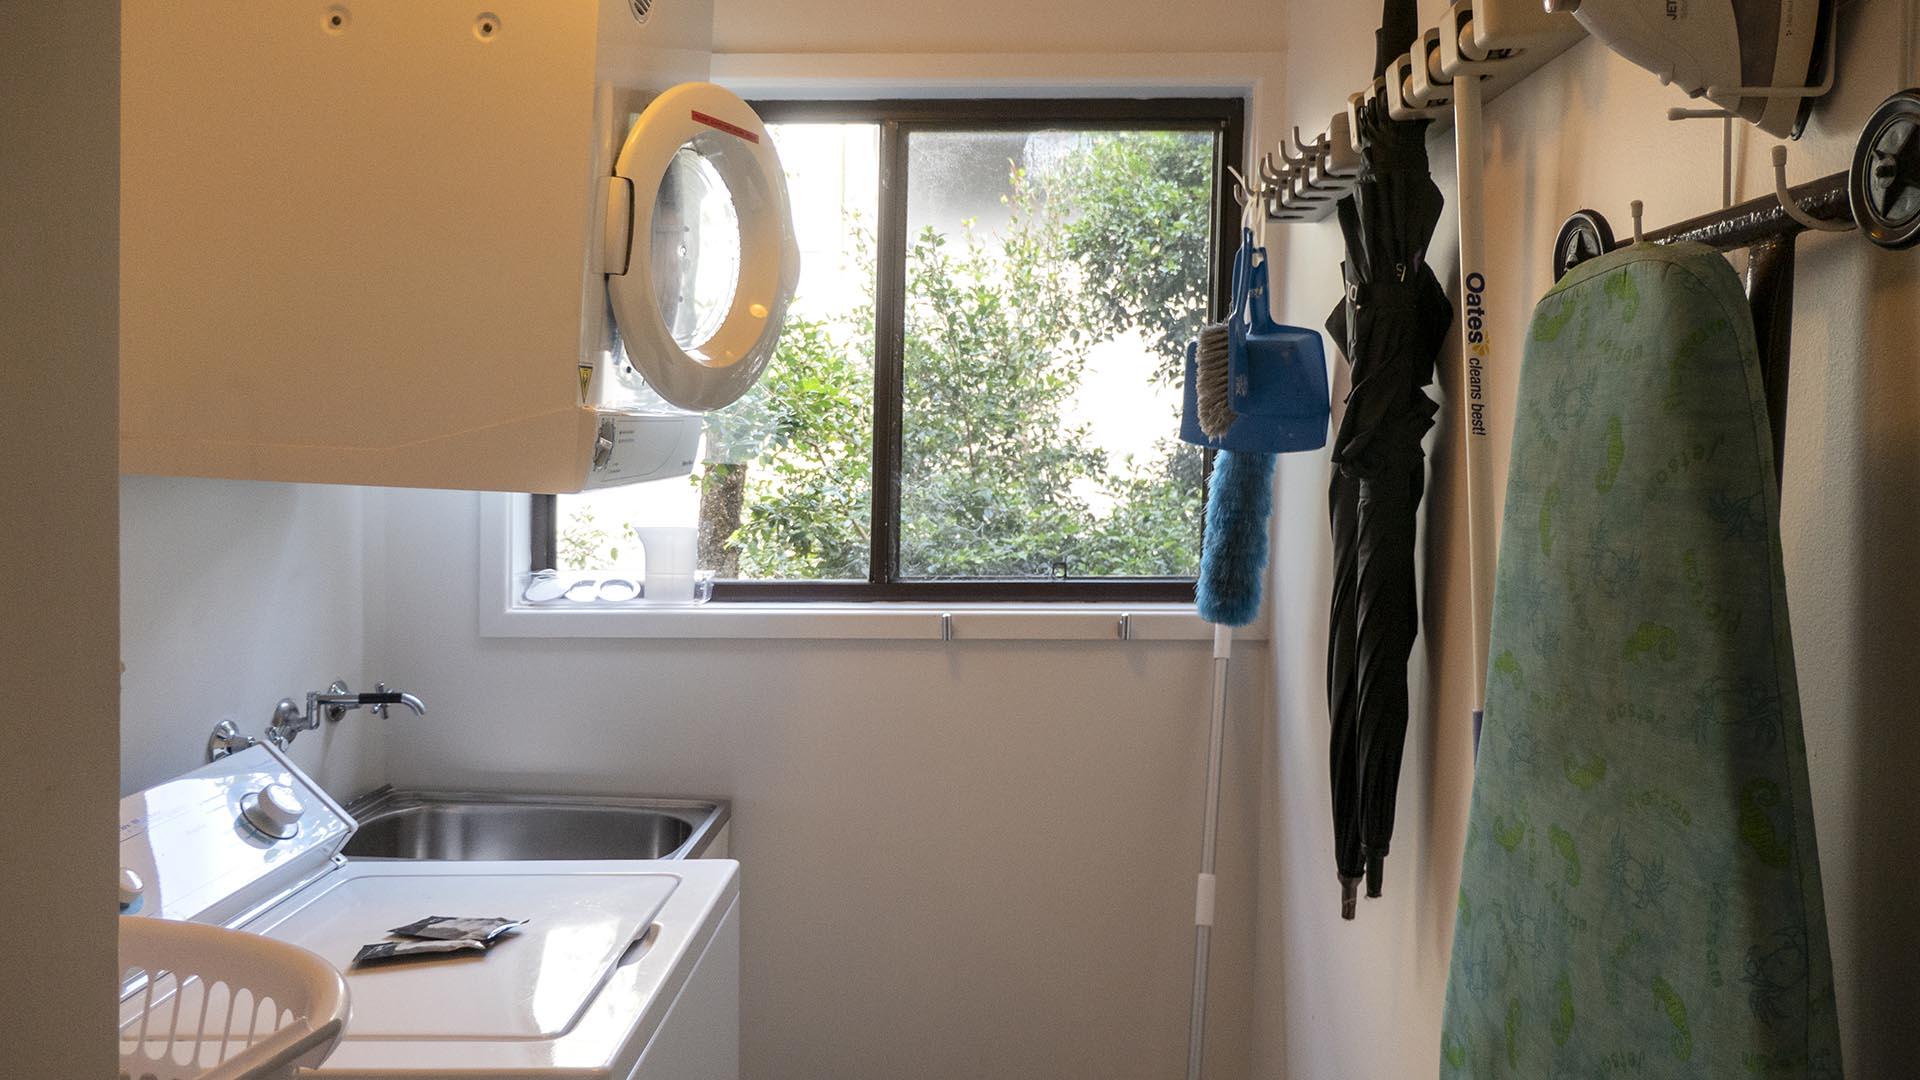 Adequate Laundry with Washing machine plus dryer. Copa Beachside.